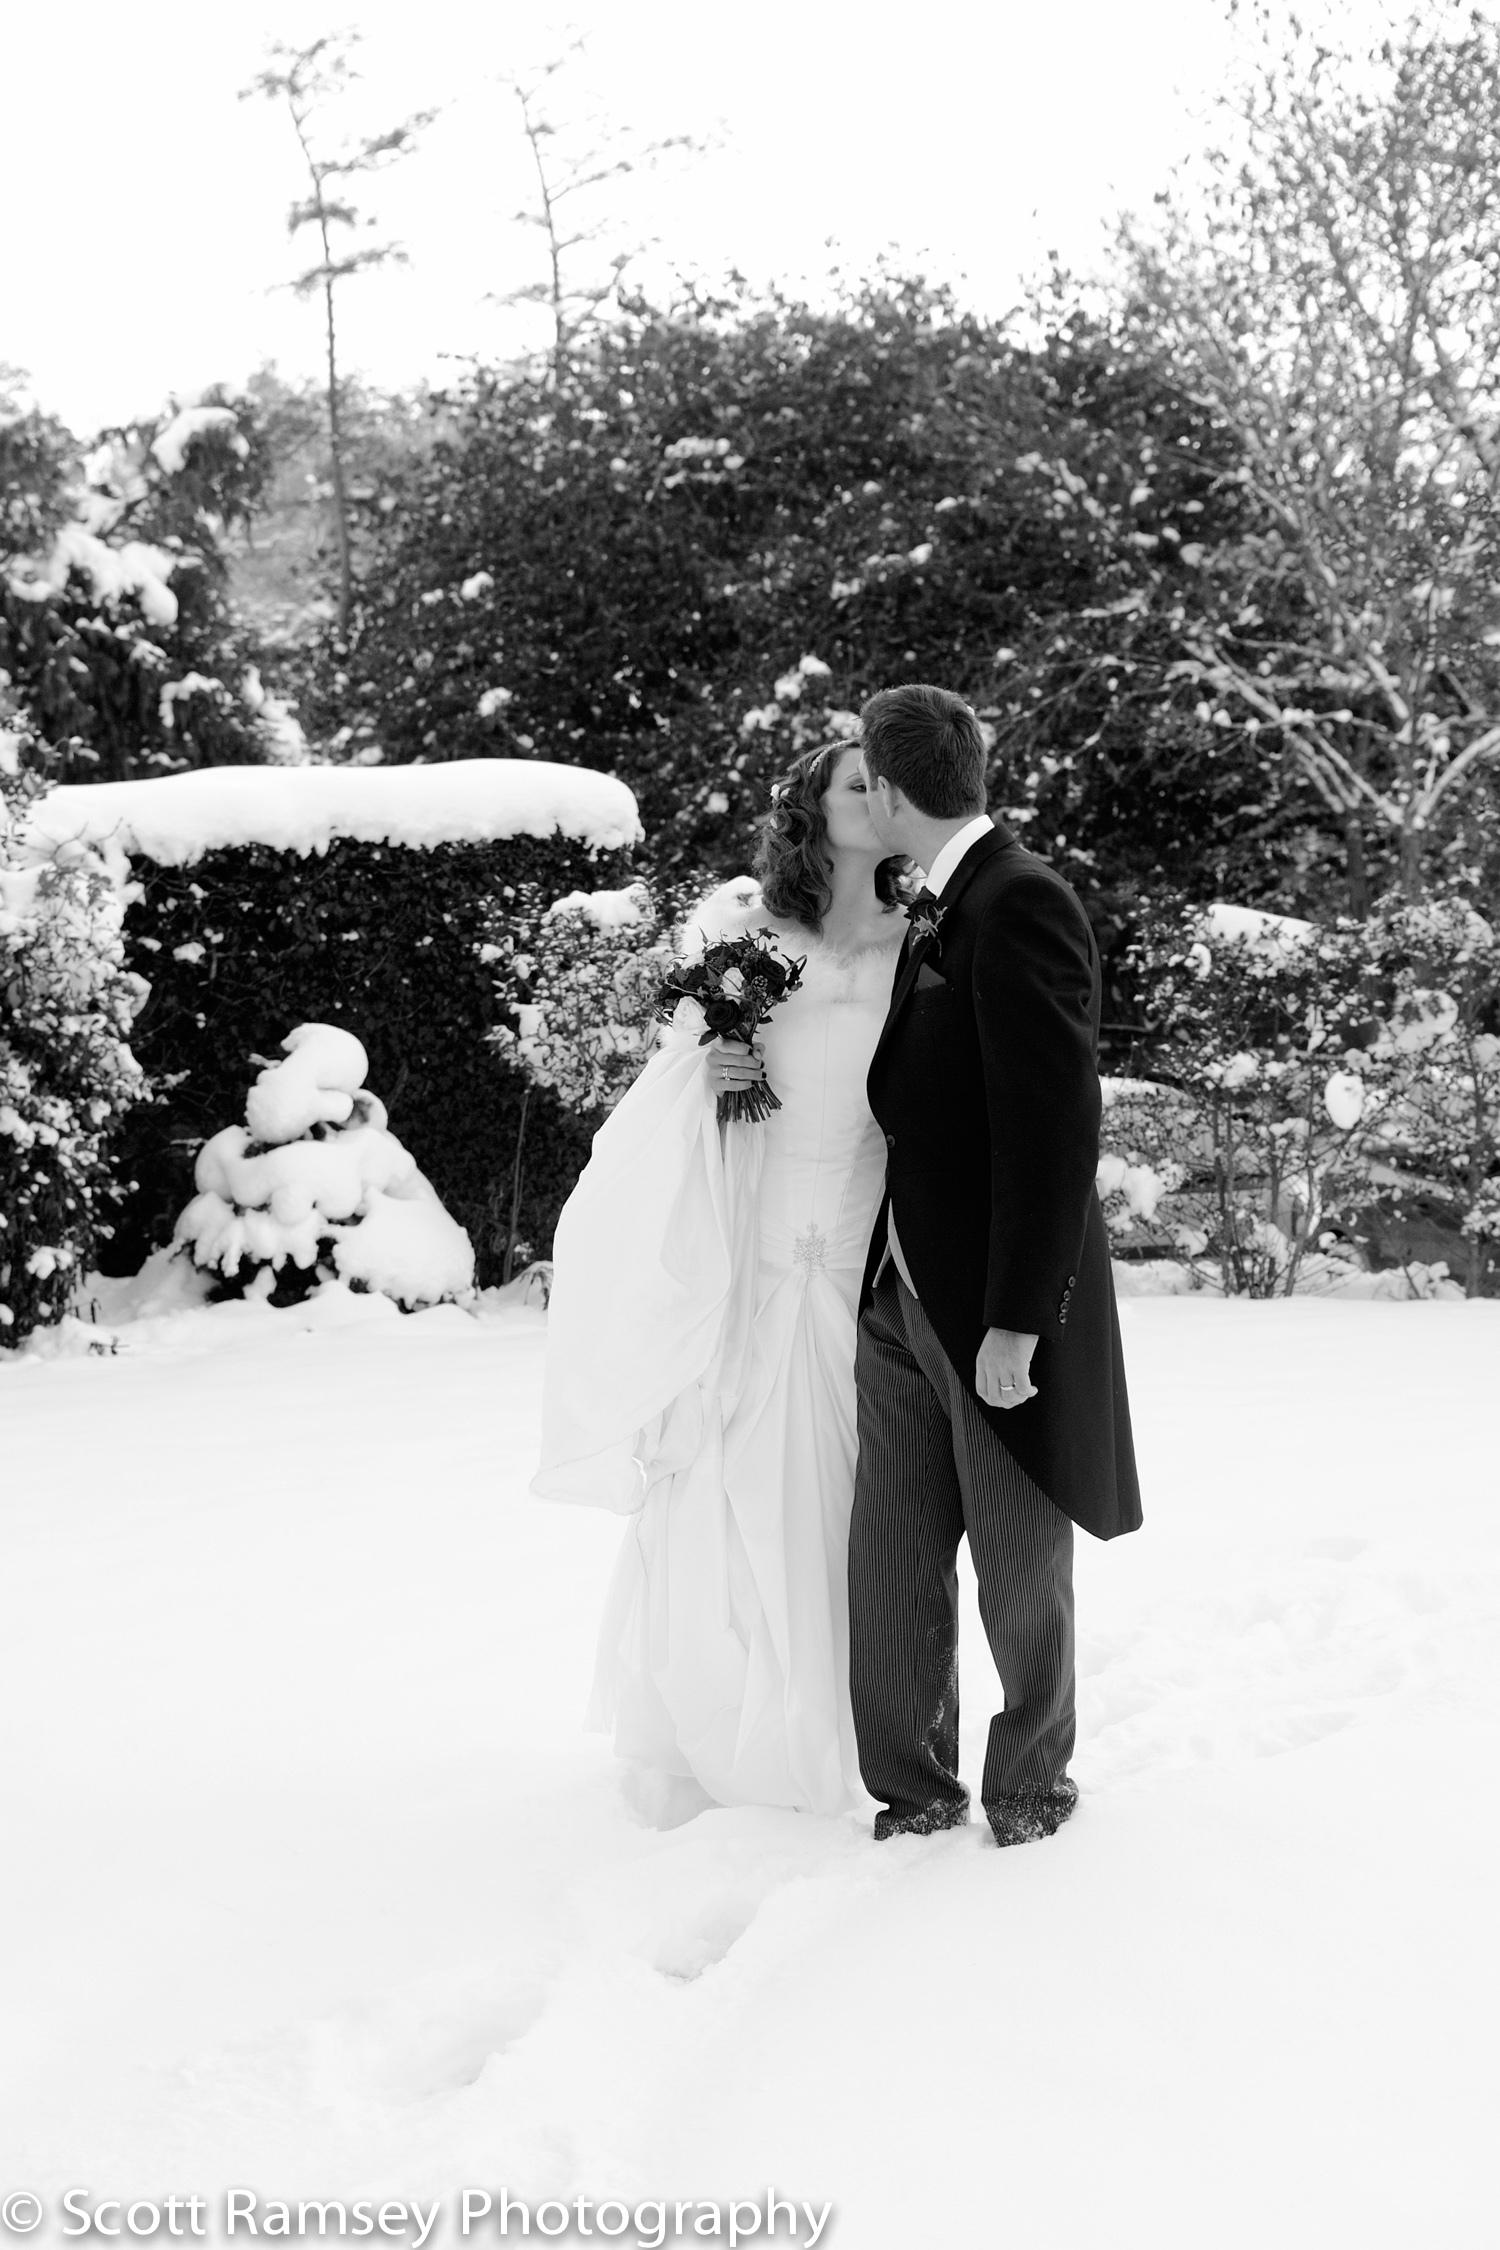 Winter-Wedding-Spread-Eagle-Hotel-Midhurst-Romantic-Bride-Groom-